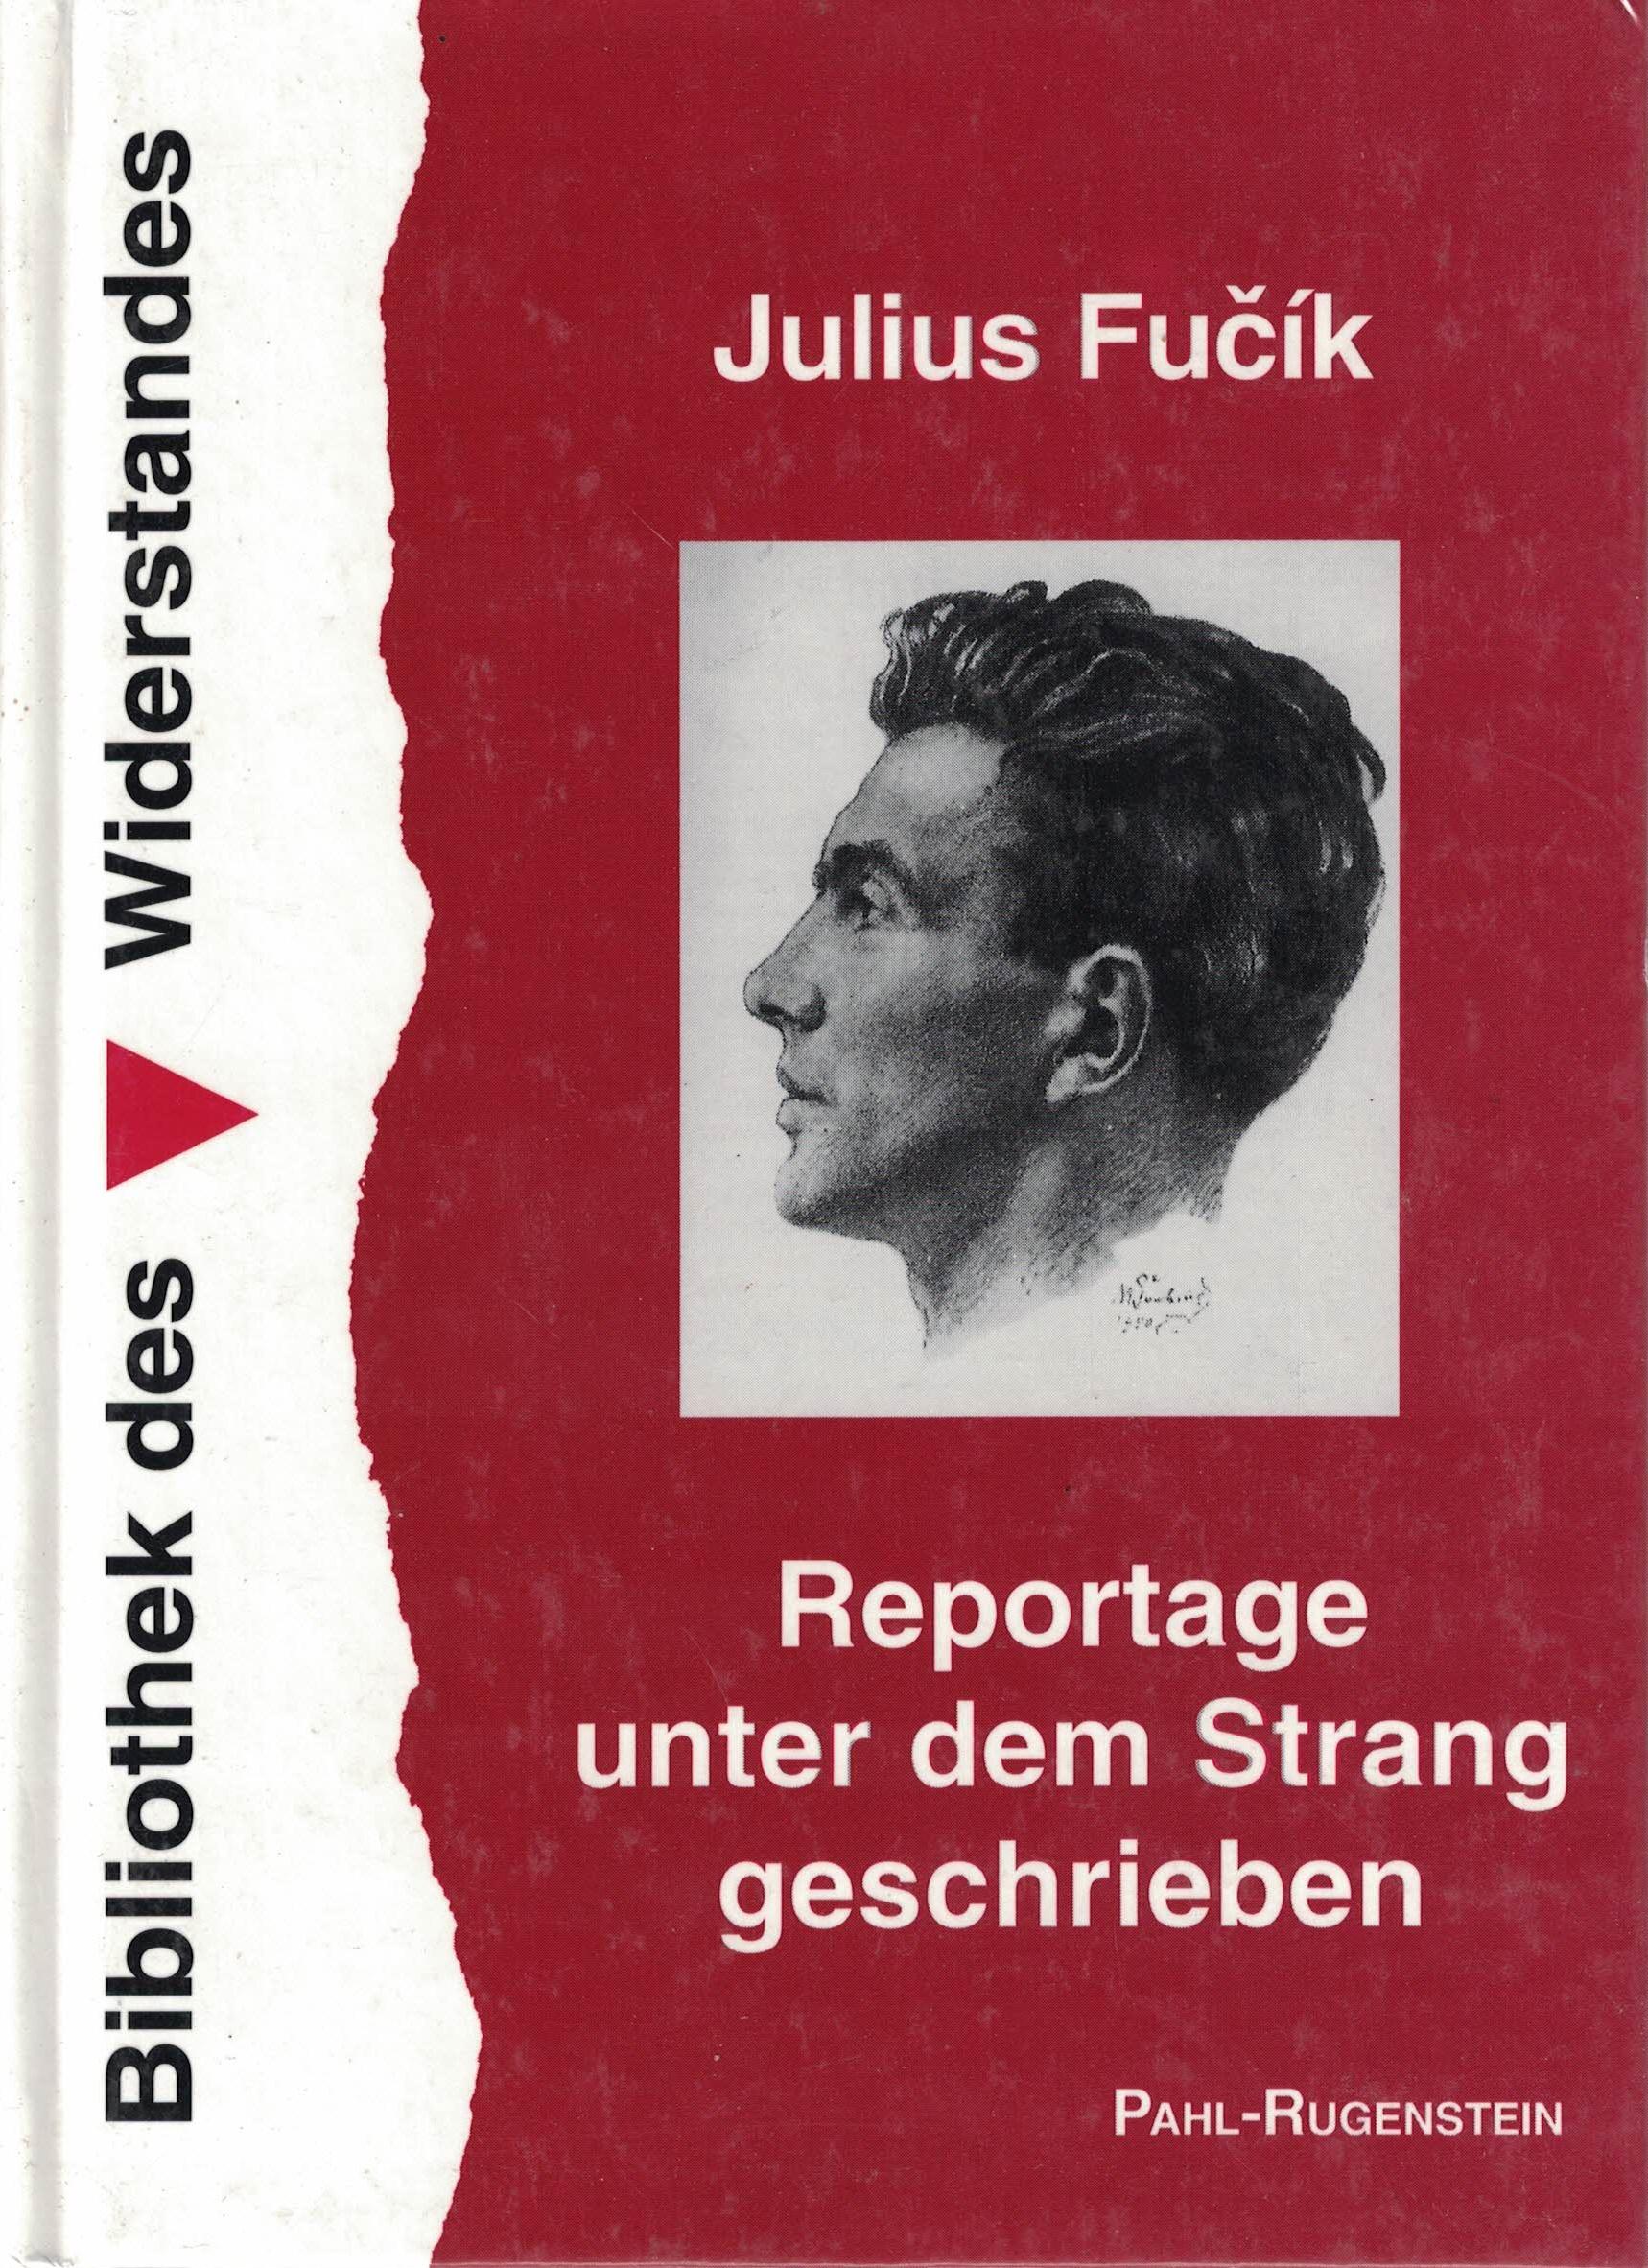 Julius Fucik - Reportage unter dem Strang geschrieben